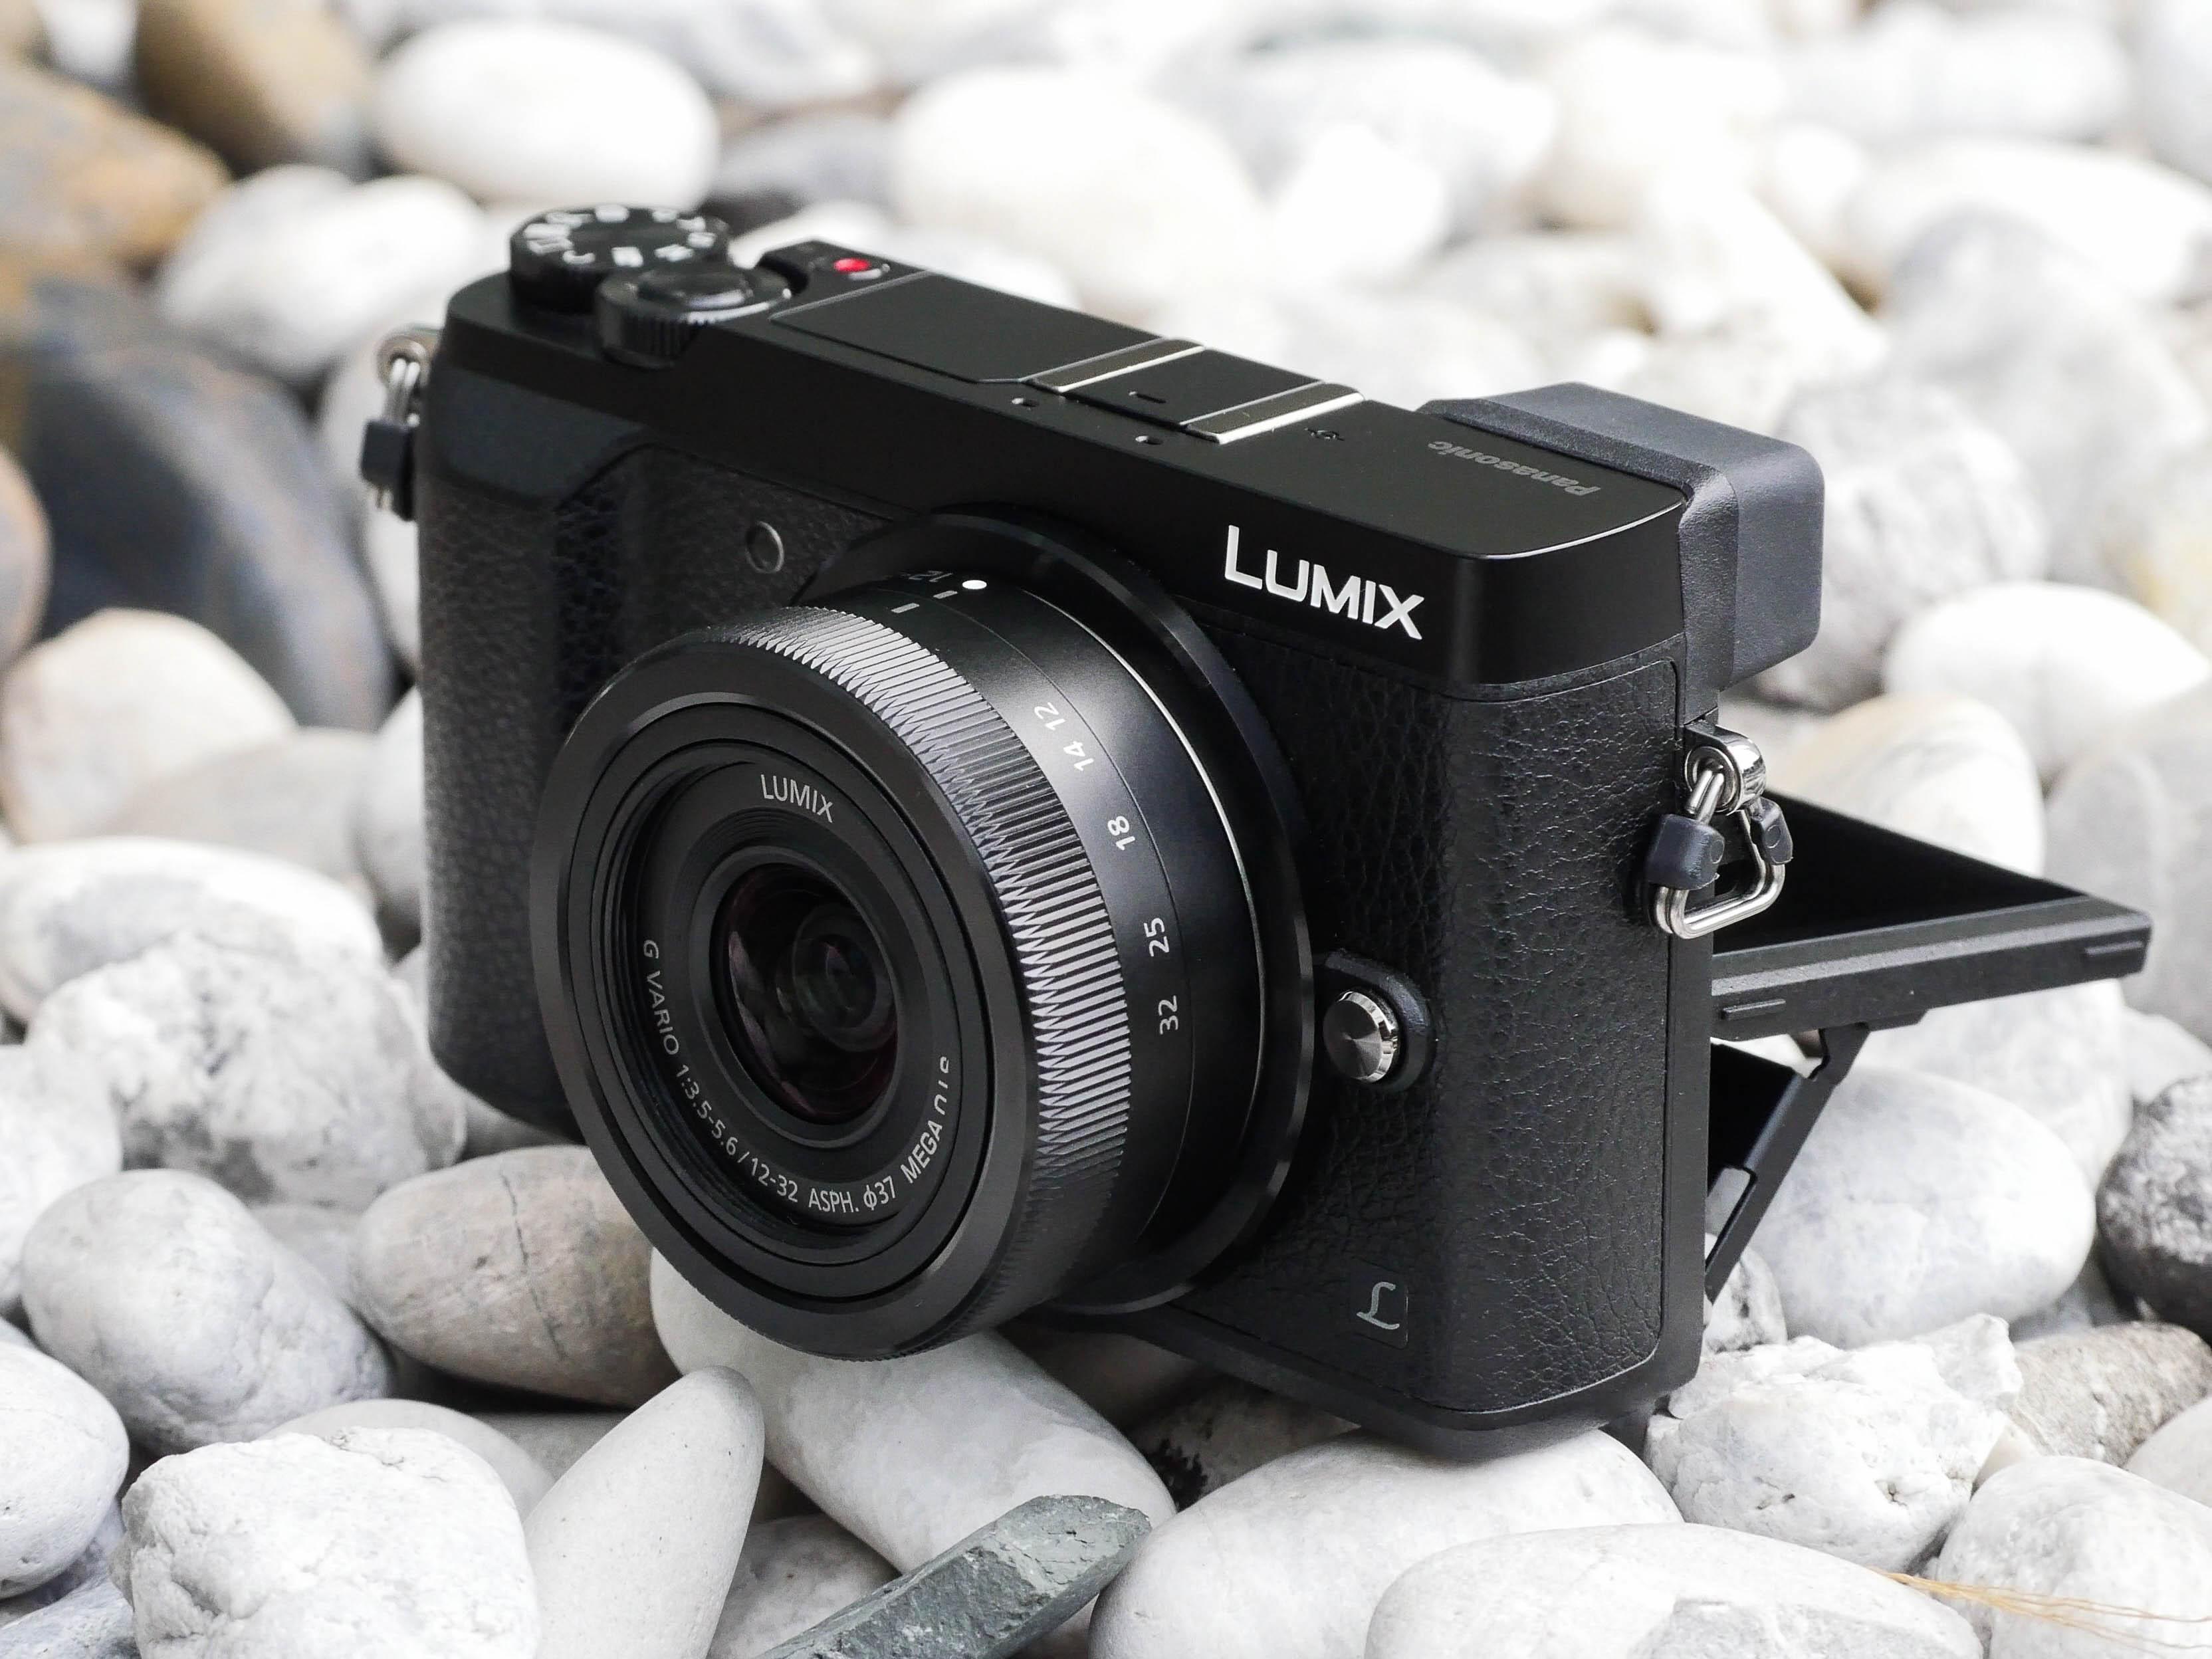 Panasonic Lumix Gx85 Mirrorless 4k 5 Gx85k Lensa 12 32mm Kamera Dmc Live Mos Sensor W O Low Pass Filter 16 Max Resolution 4592 X 3448 1 4000 Sec